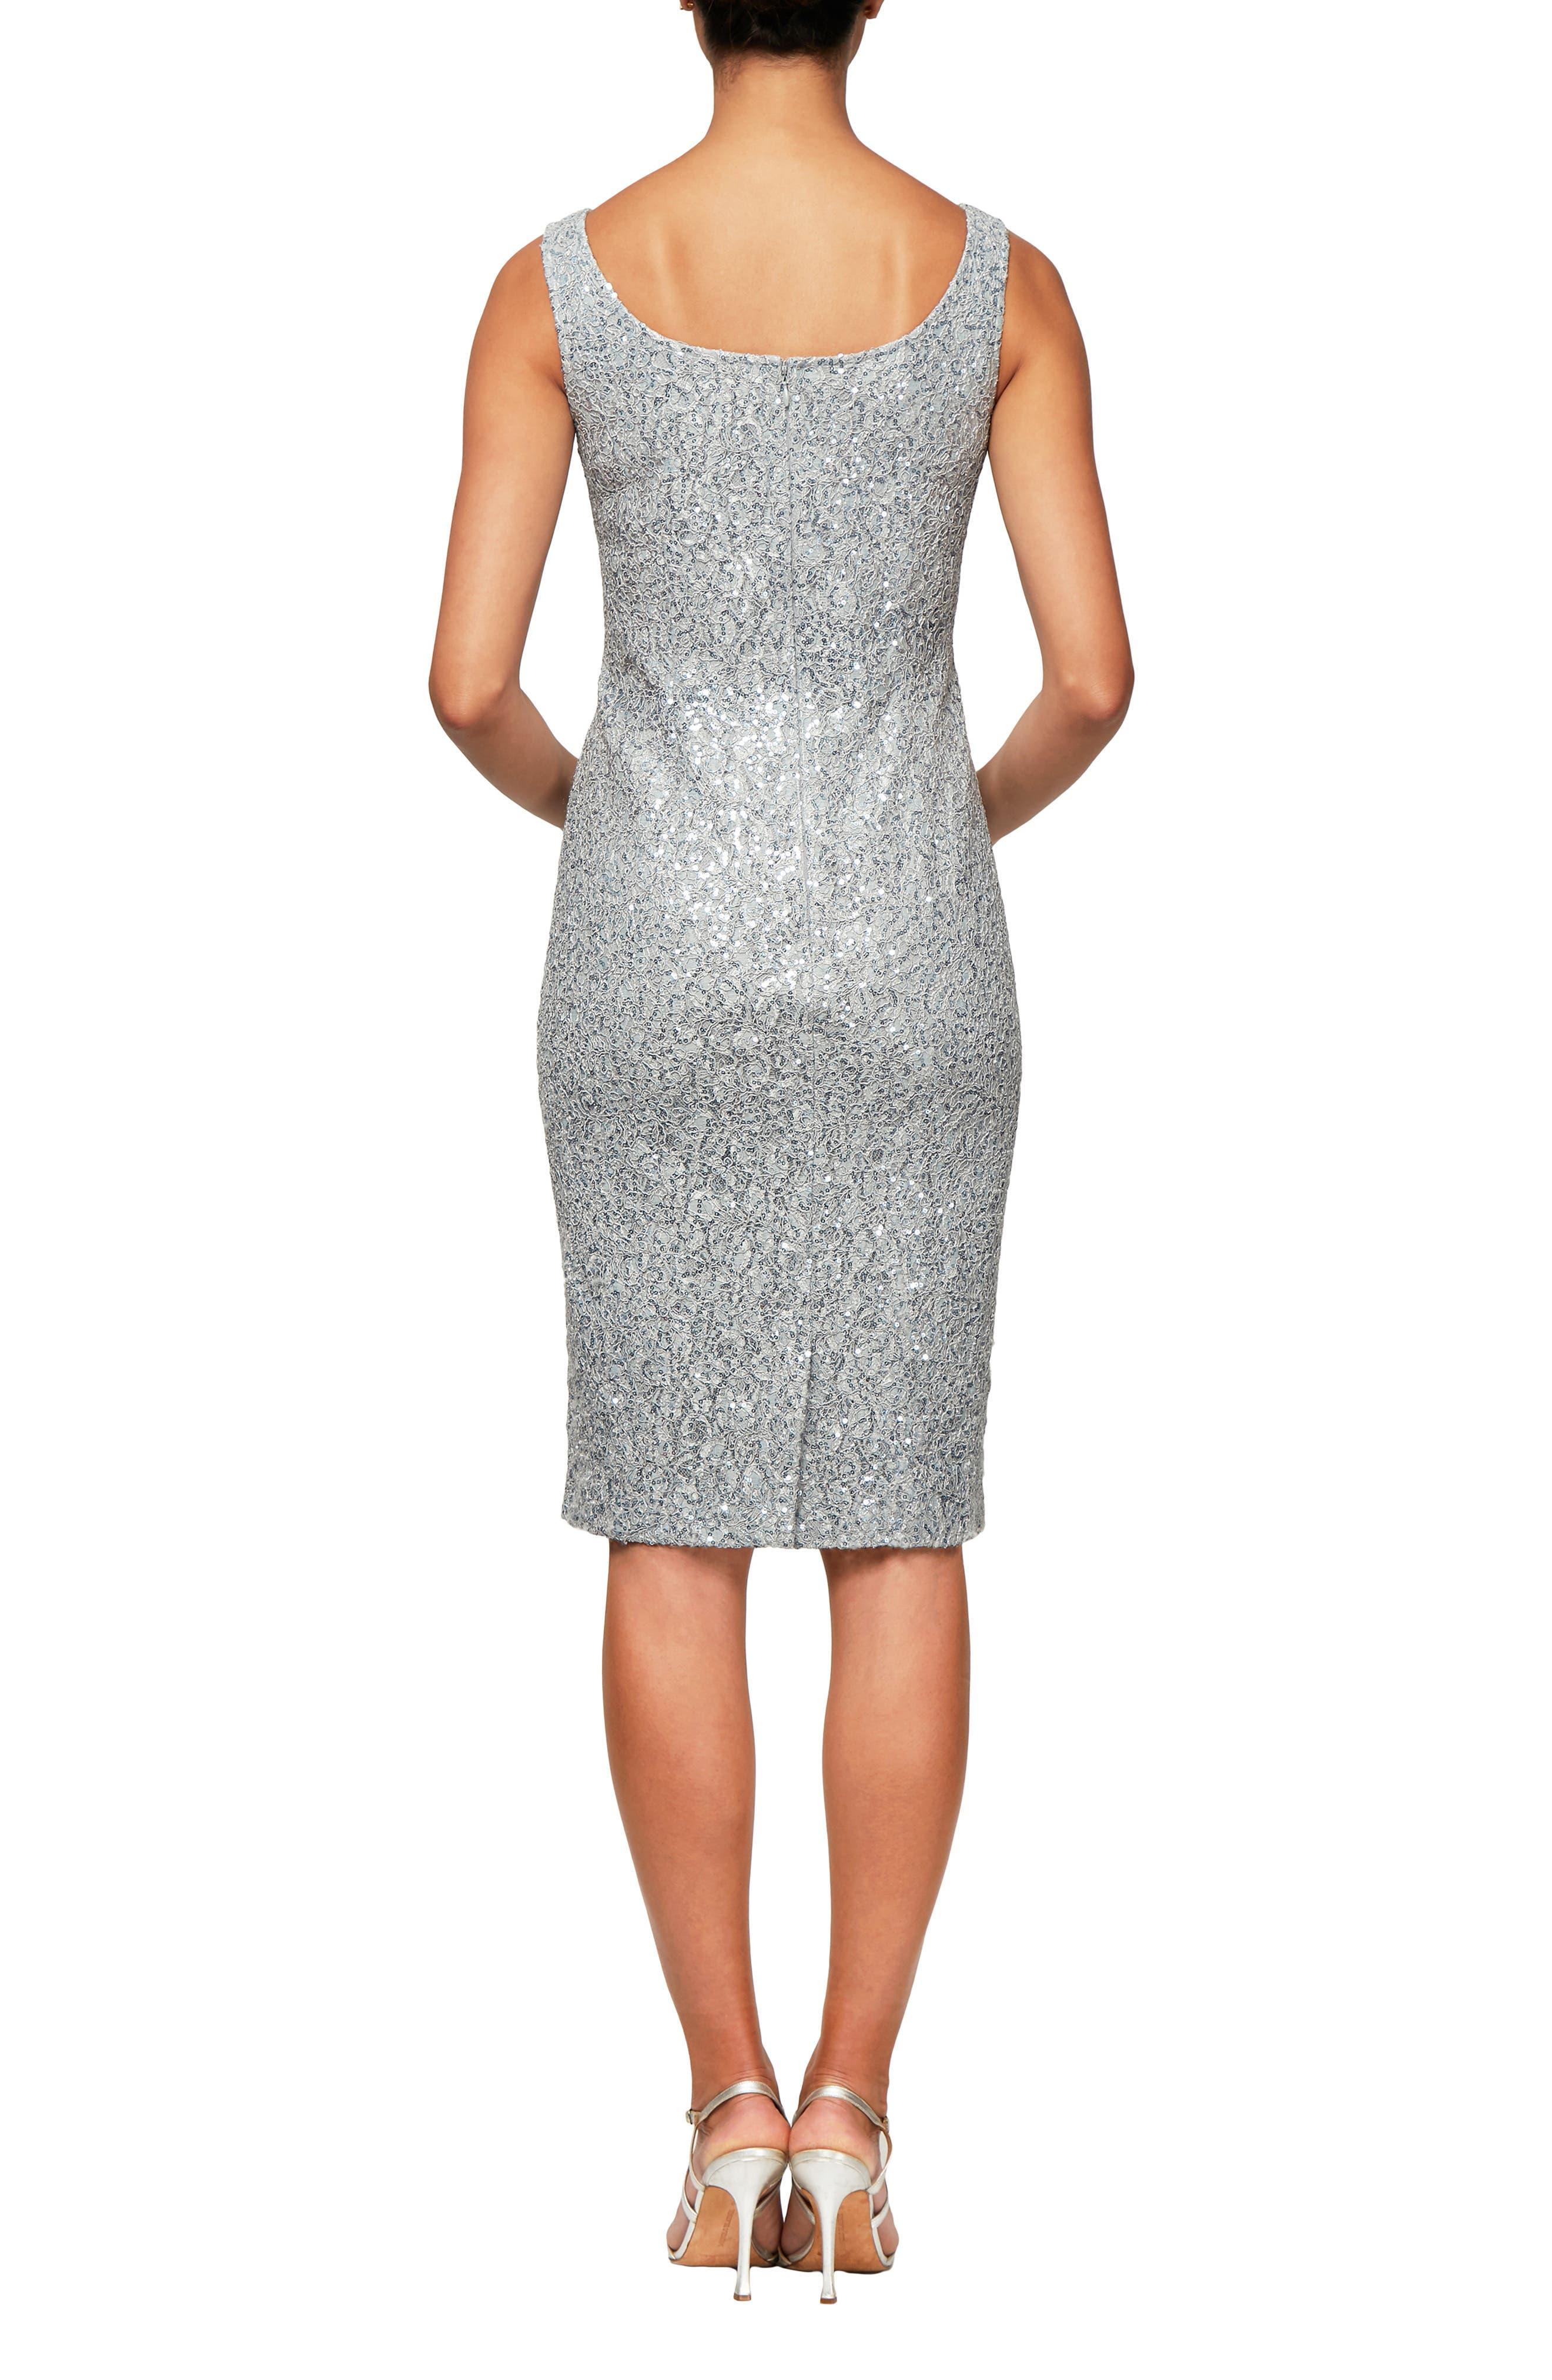 ALEX EVENINGS,                             Sequin Sheath Dress with Jacket,                             Alternate thumbnail 5, color,                             LIGHT BLUE